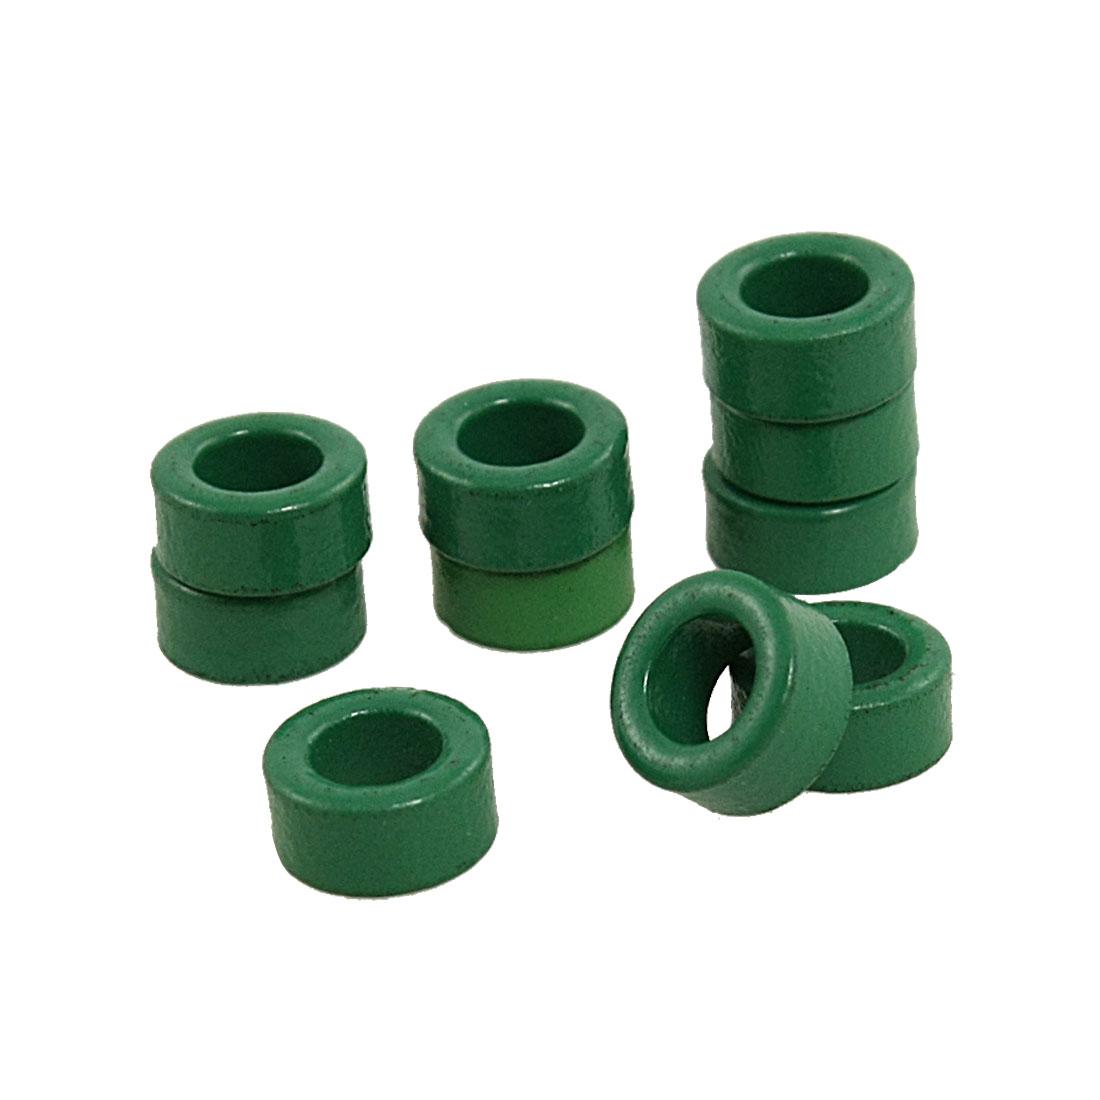 10 Pcs Inductor Coils Green Toroid Ferrite Cores 10mm x 6mm x 5mm